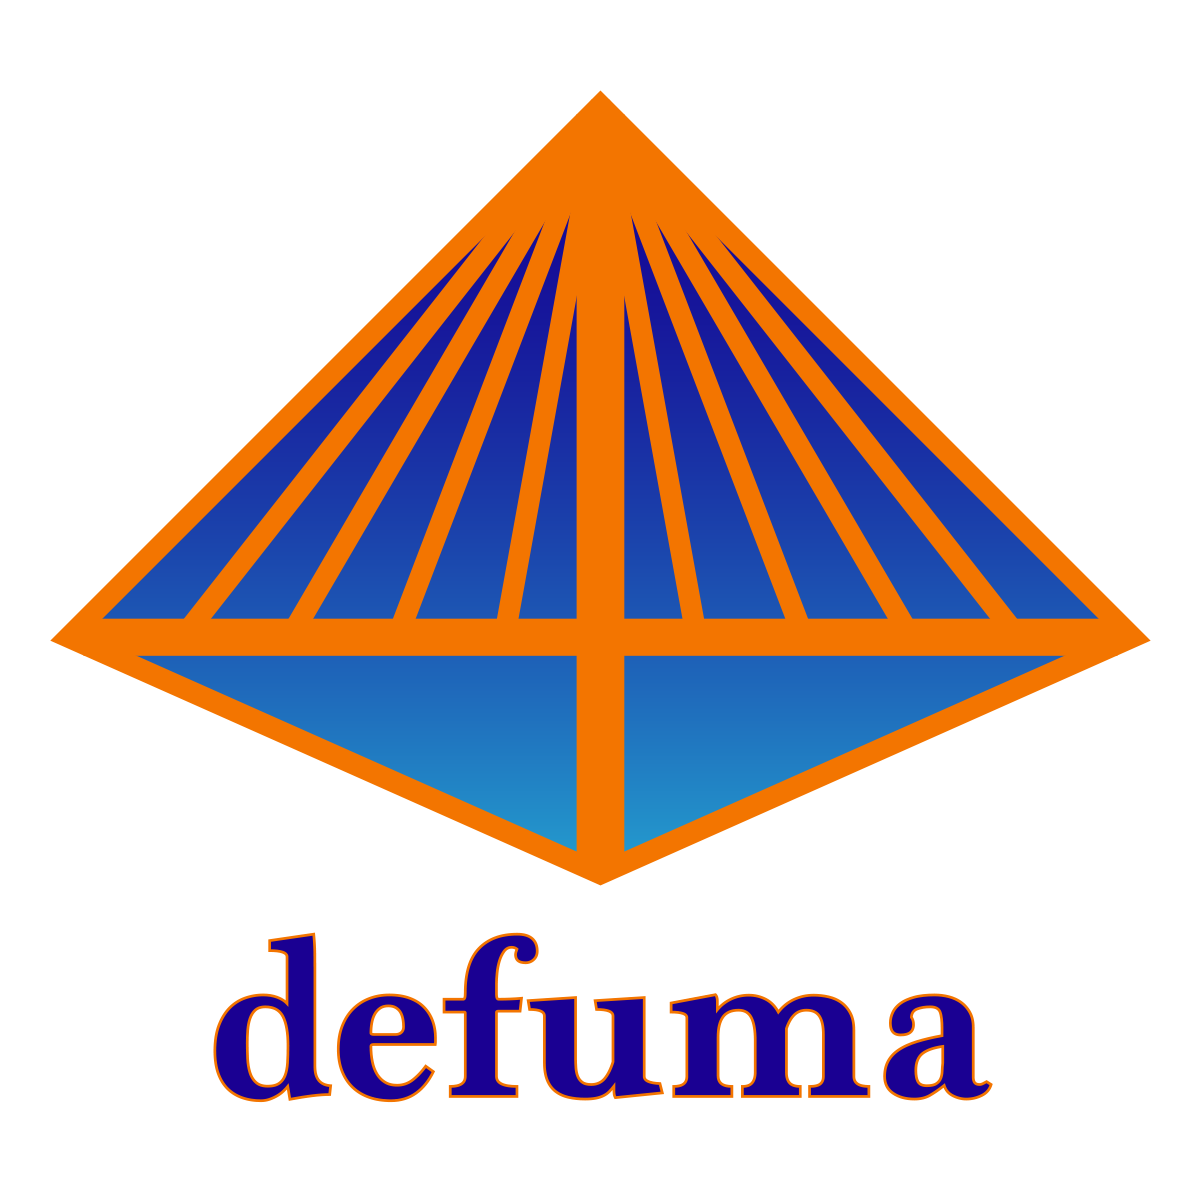 defuma: decentralized fund management